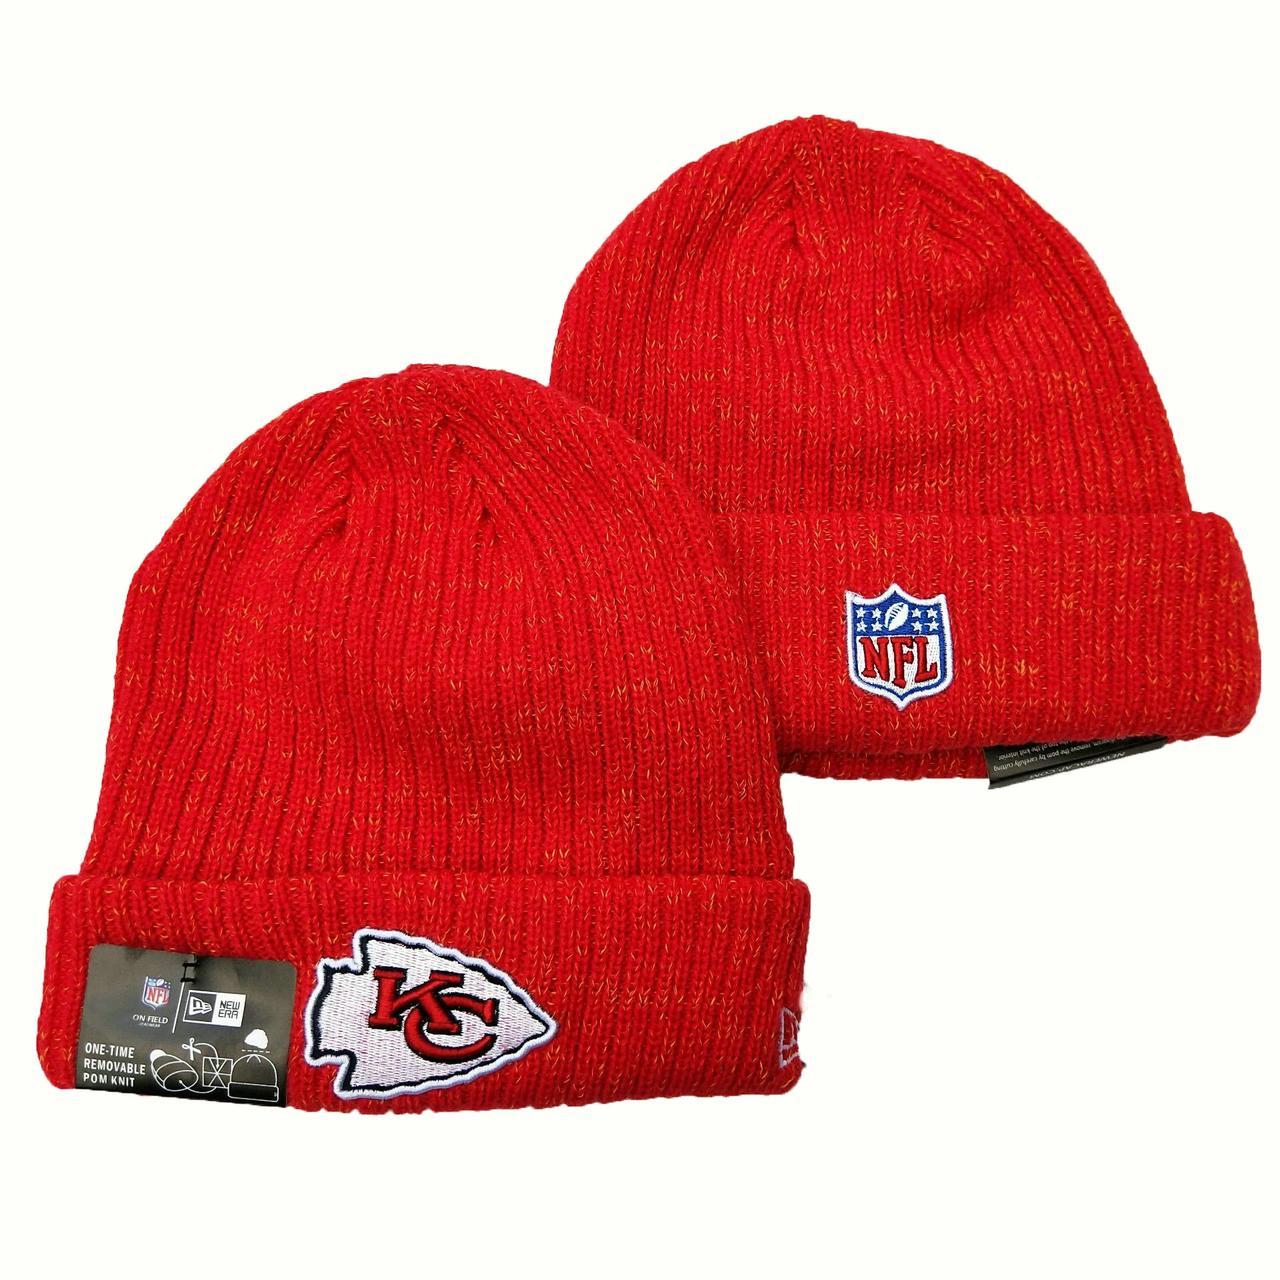 Шапка зимняя Kansas City Chiefs / SPK-339 (Реплика)